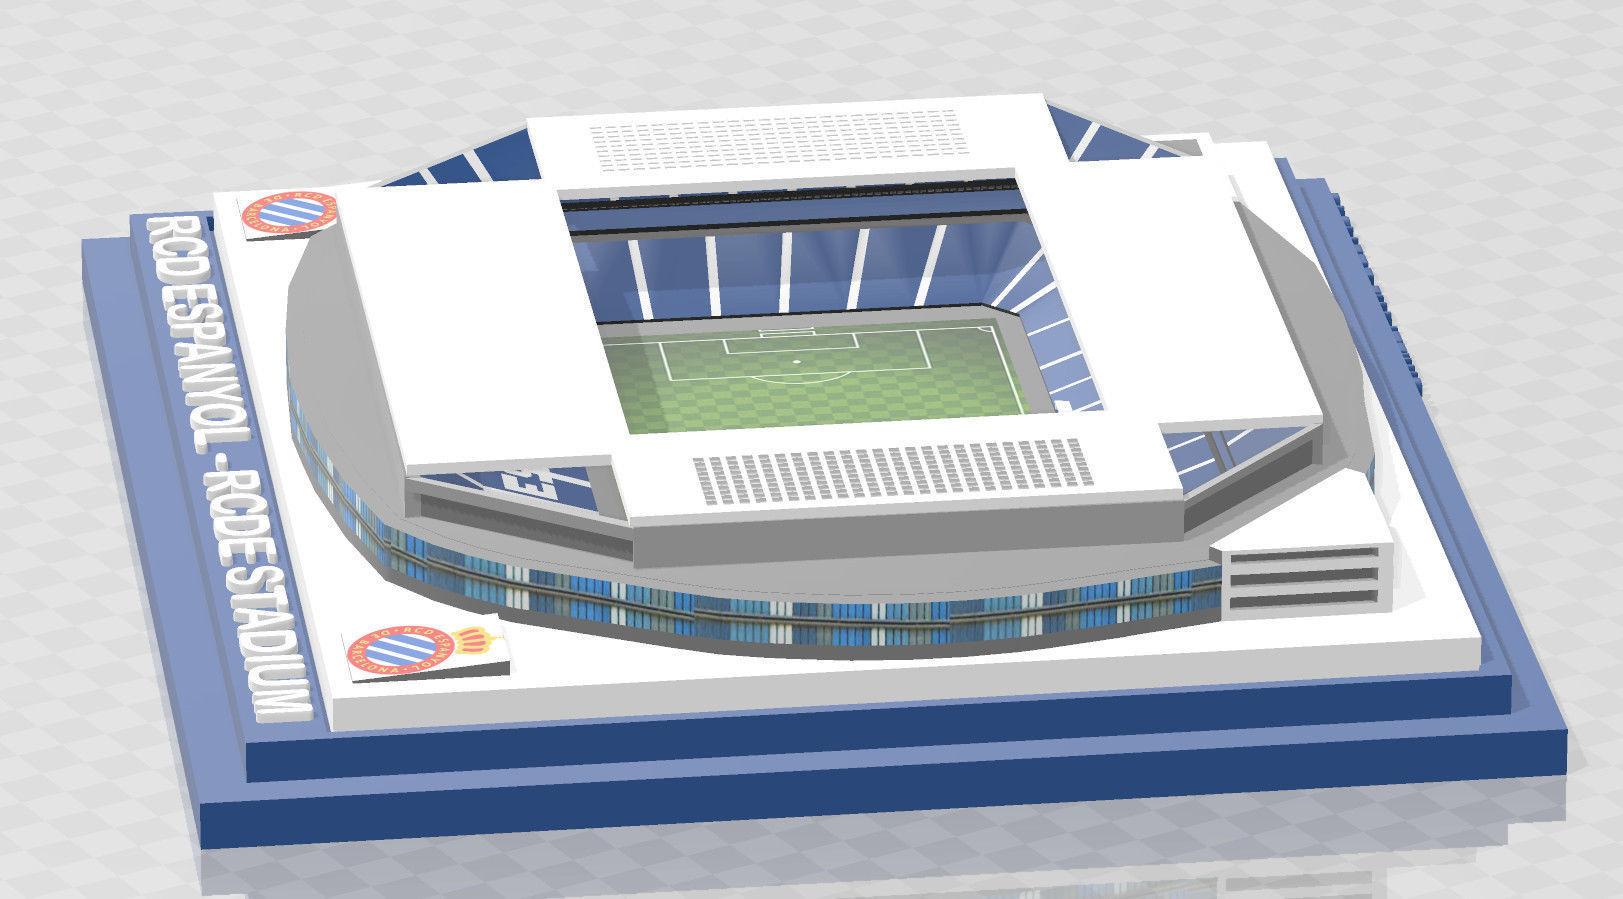 RCD Espanyol - RCDE Stadium